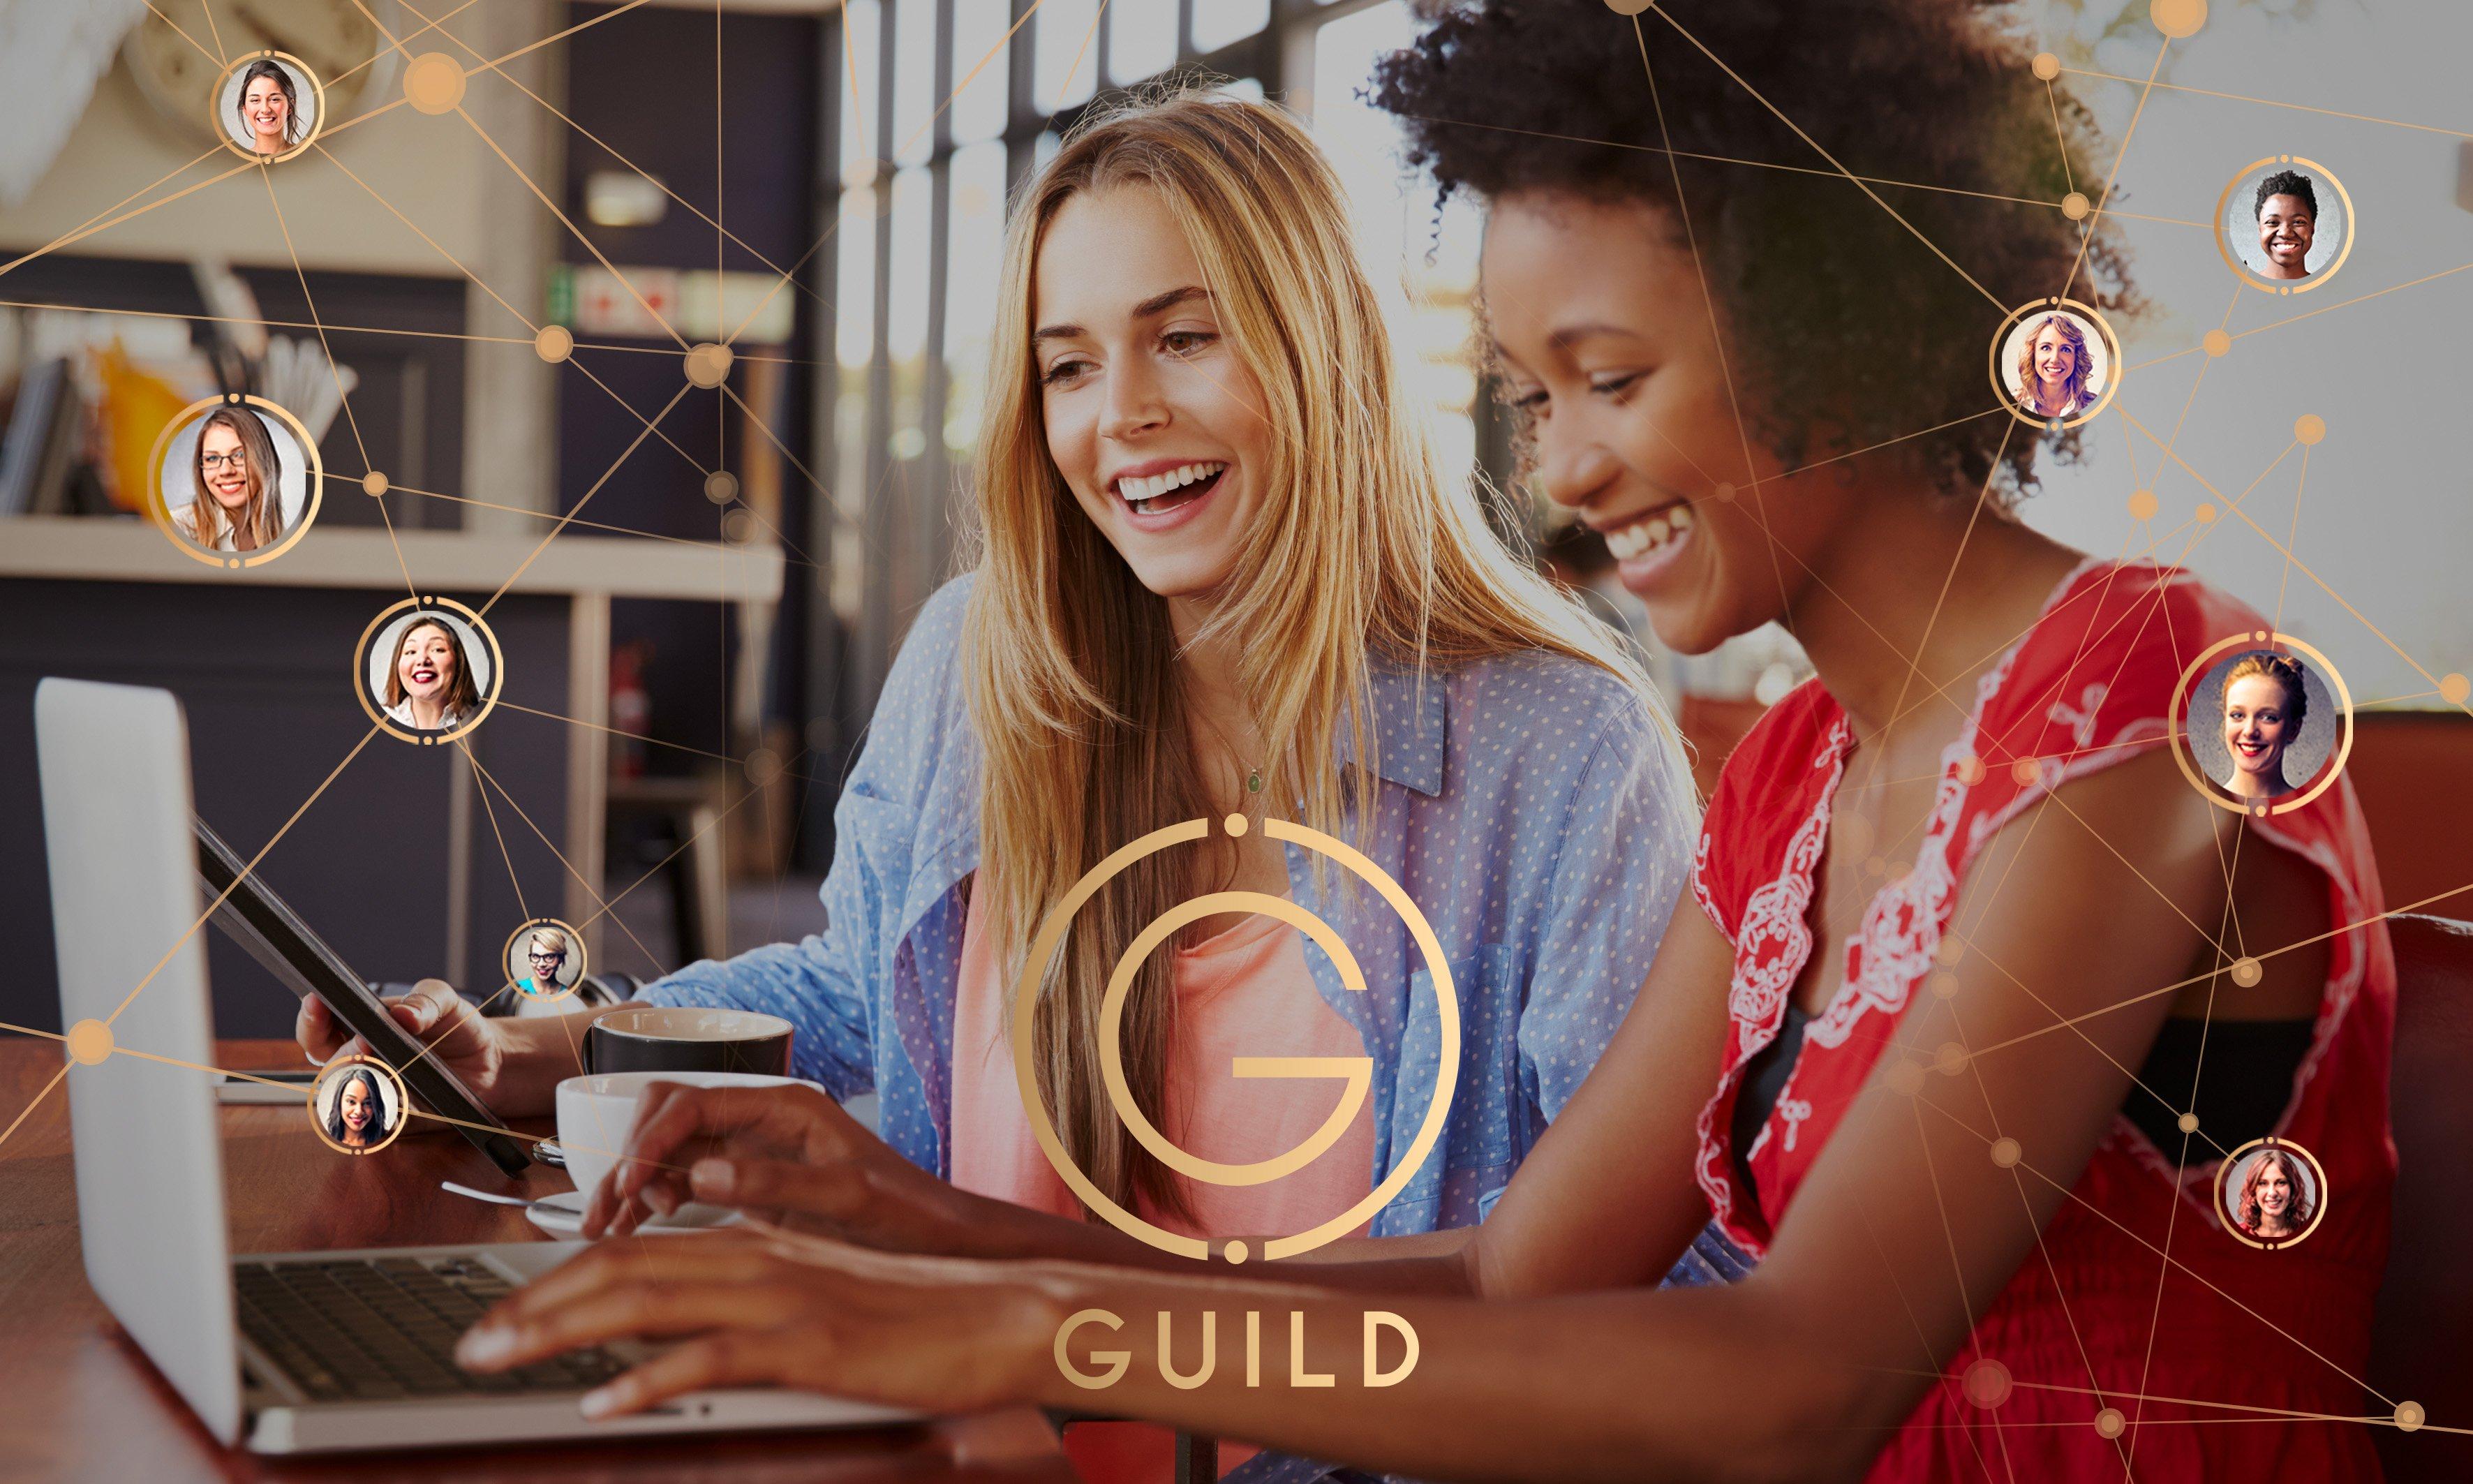 Guild and LiquidSpace